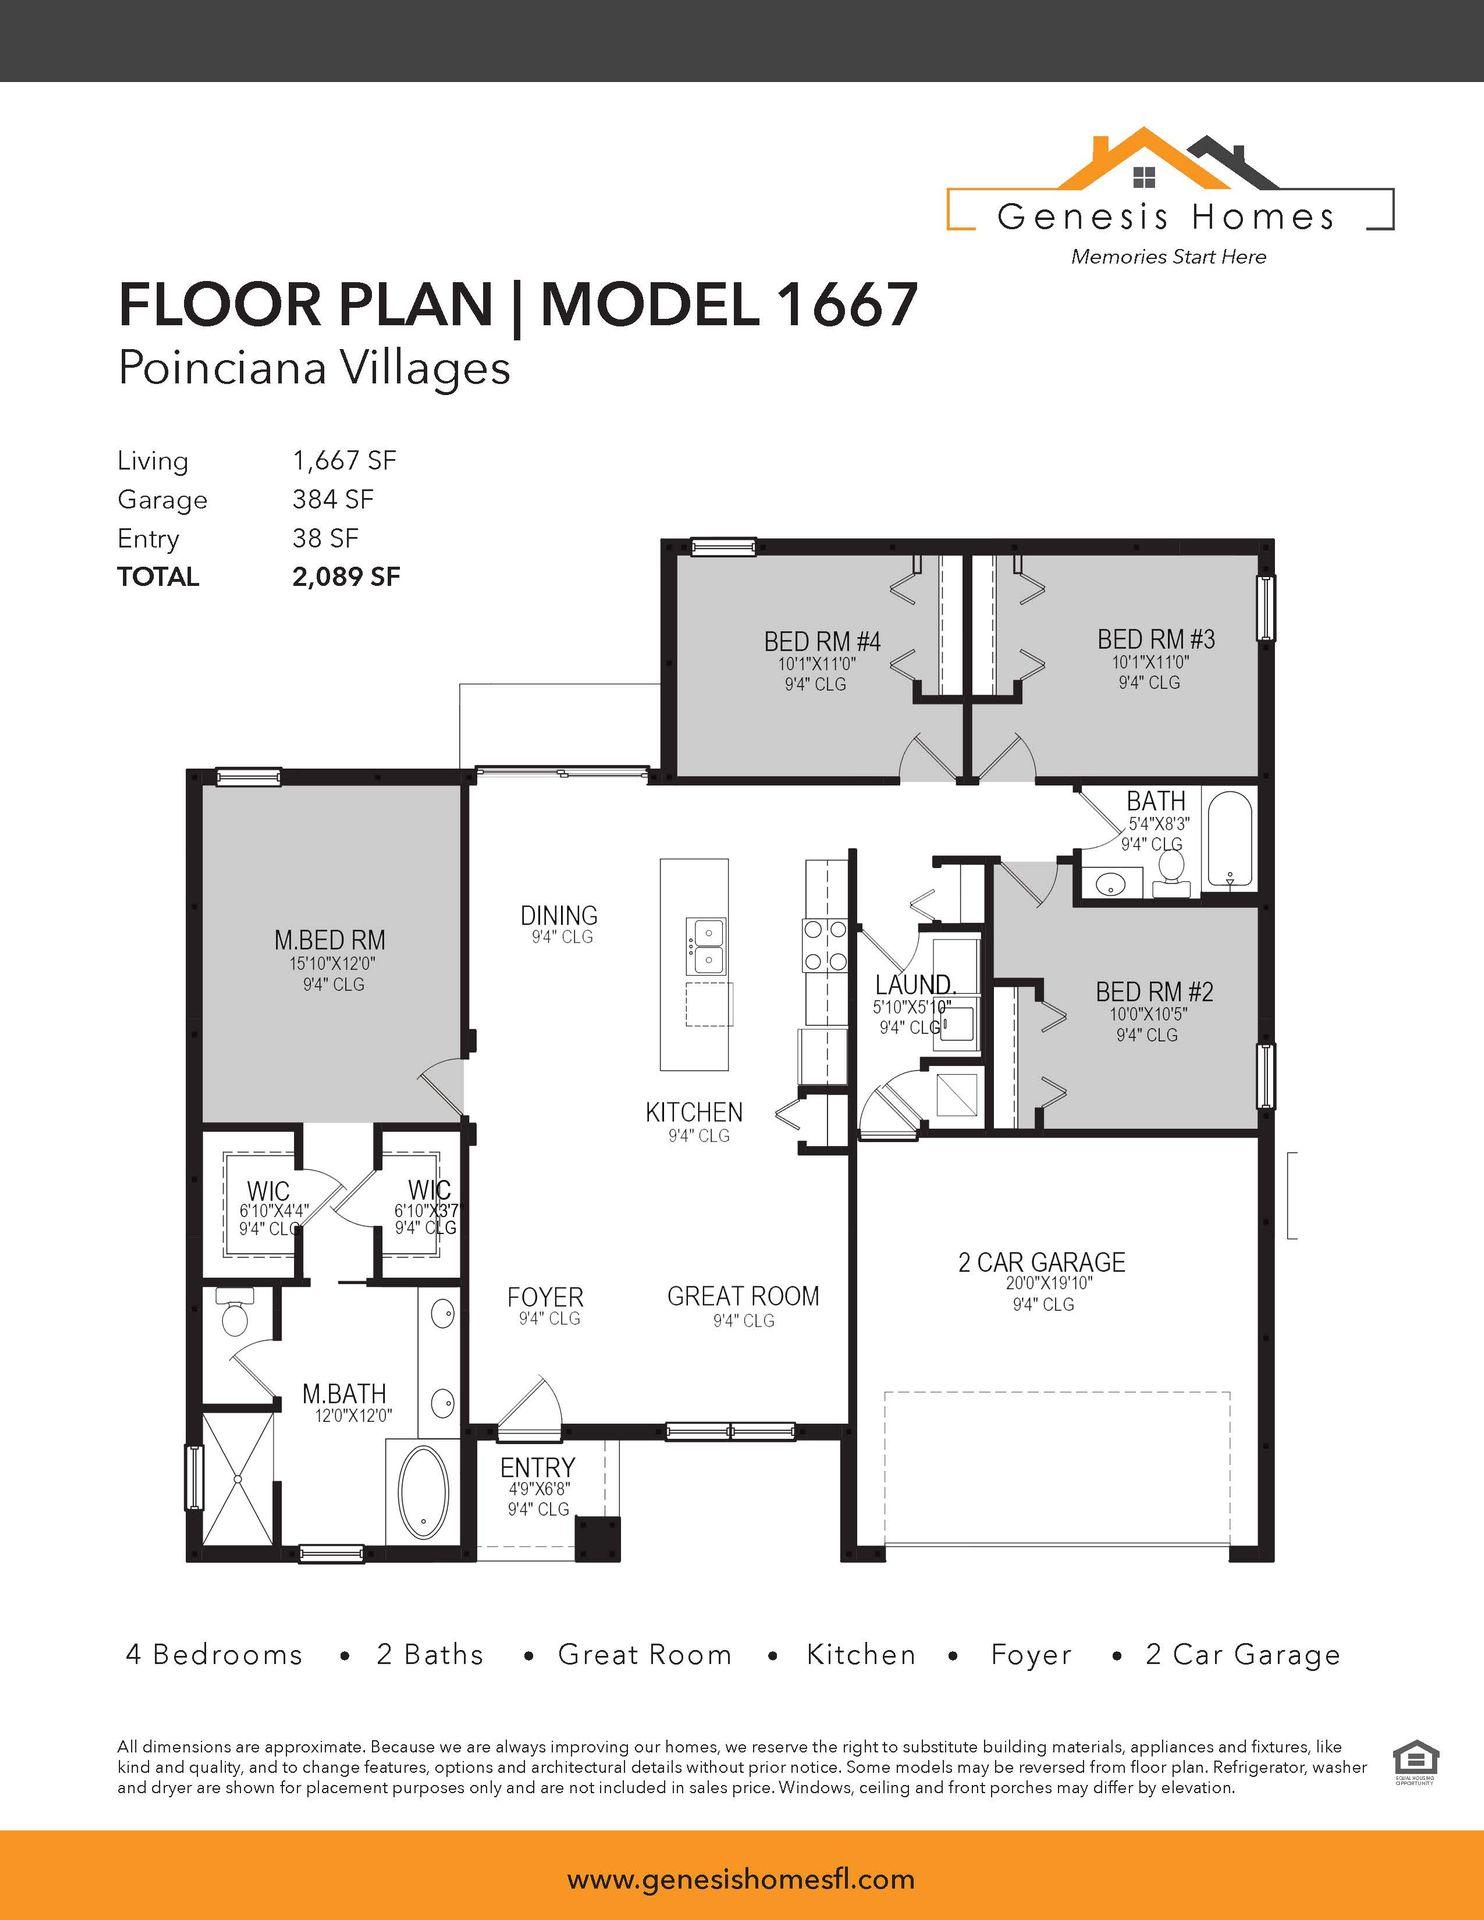 1132Hudson Harbor Lane (Custom Plan )